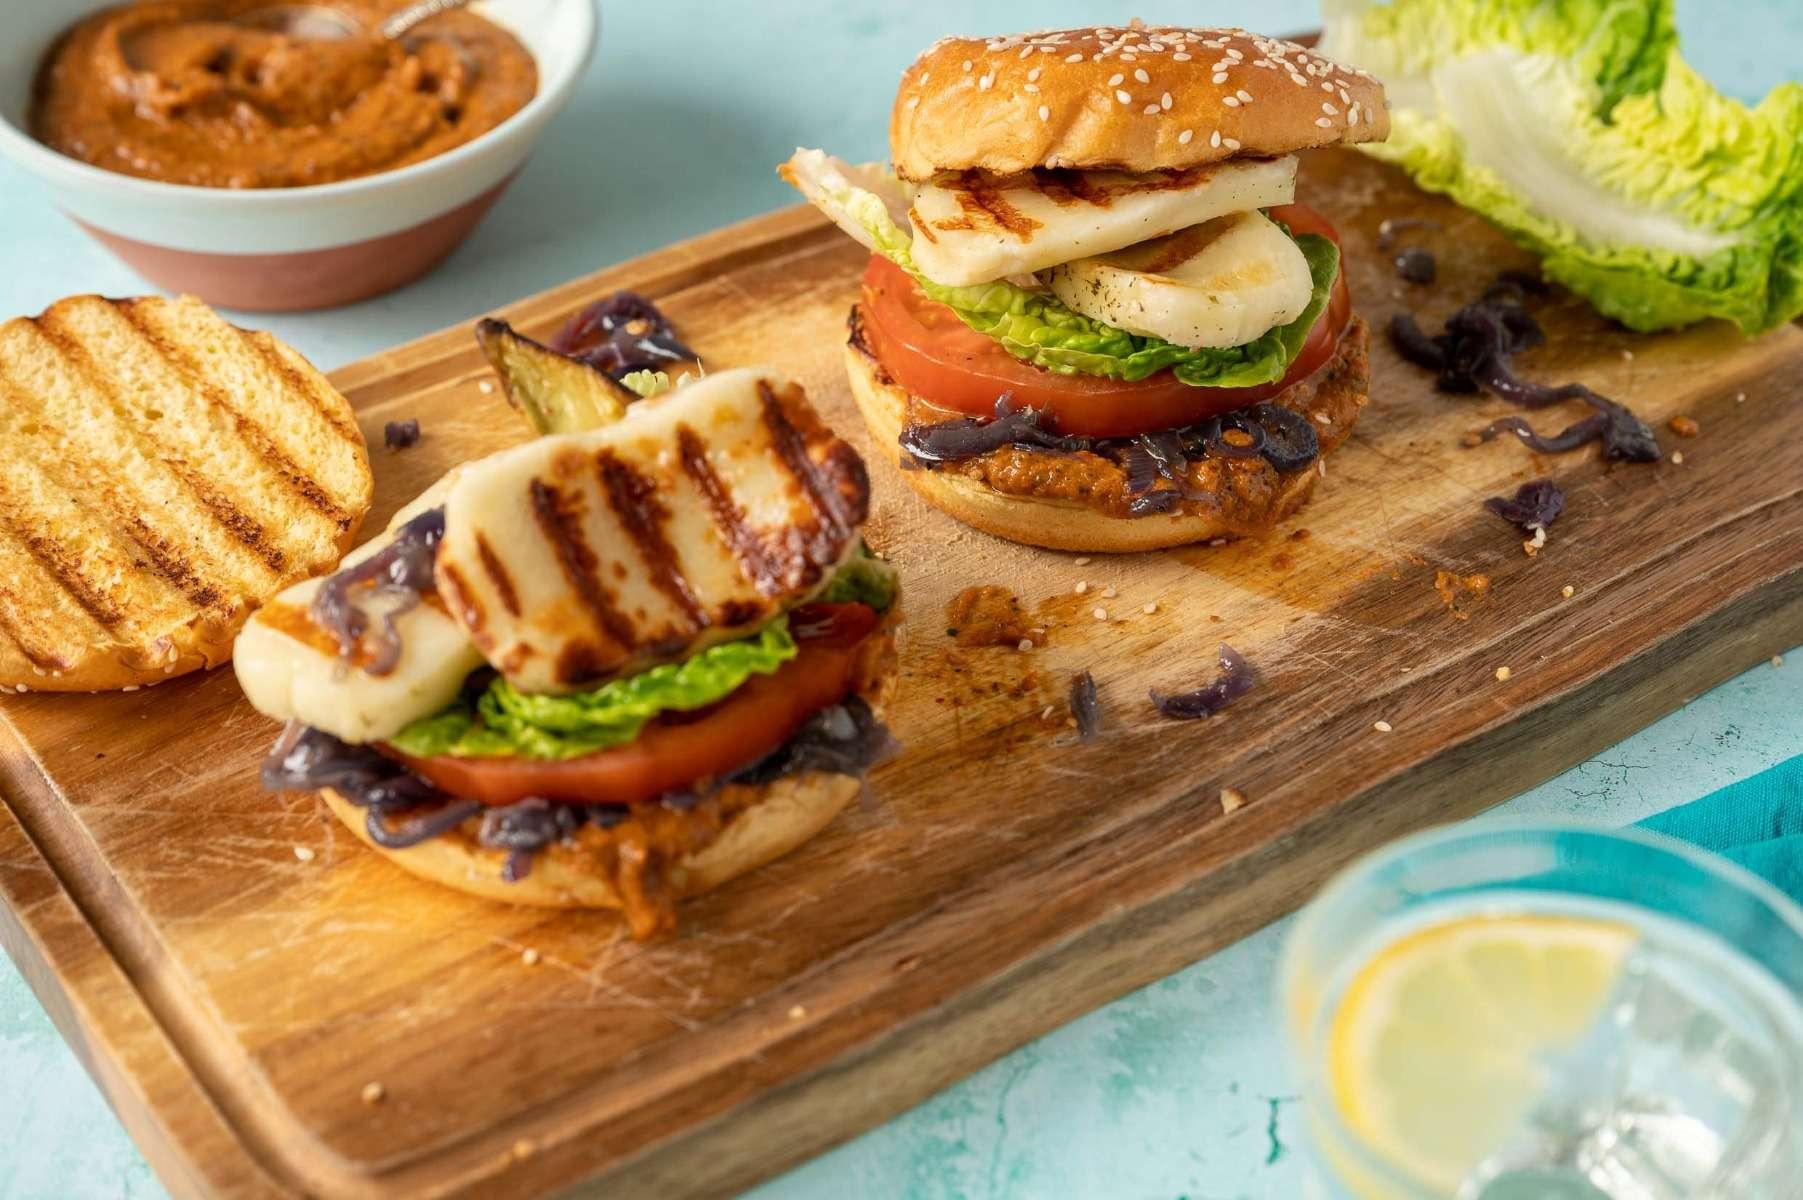 Charred Avocado & Halloumi Burger